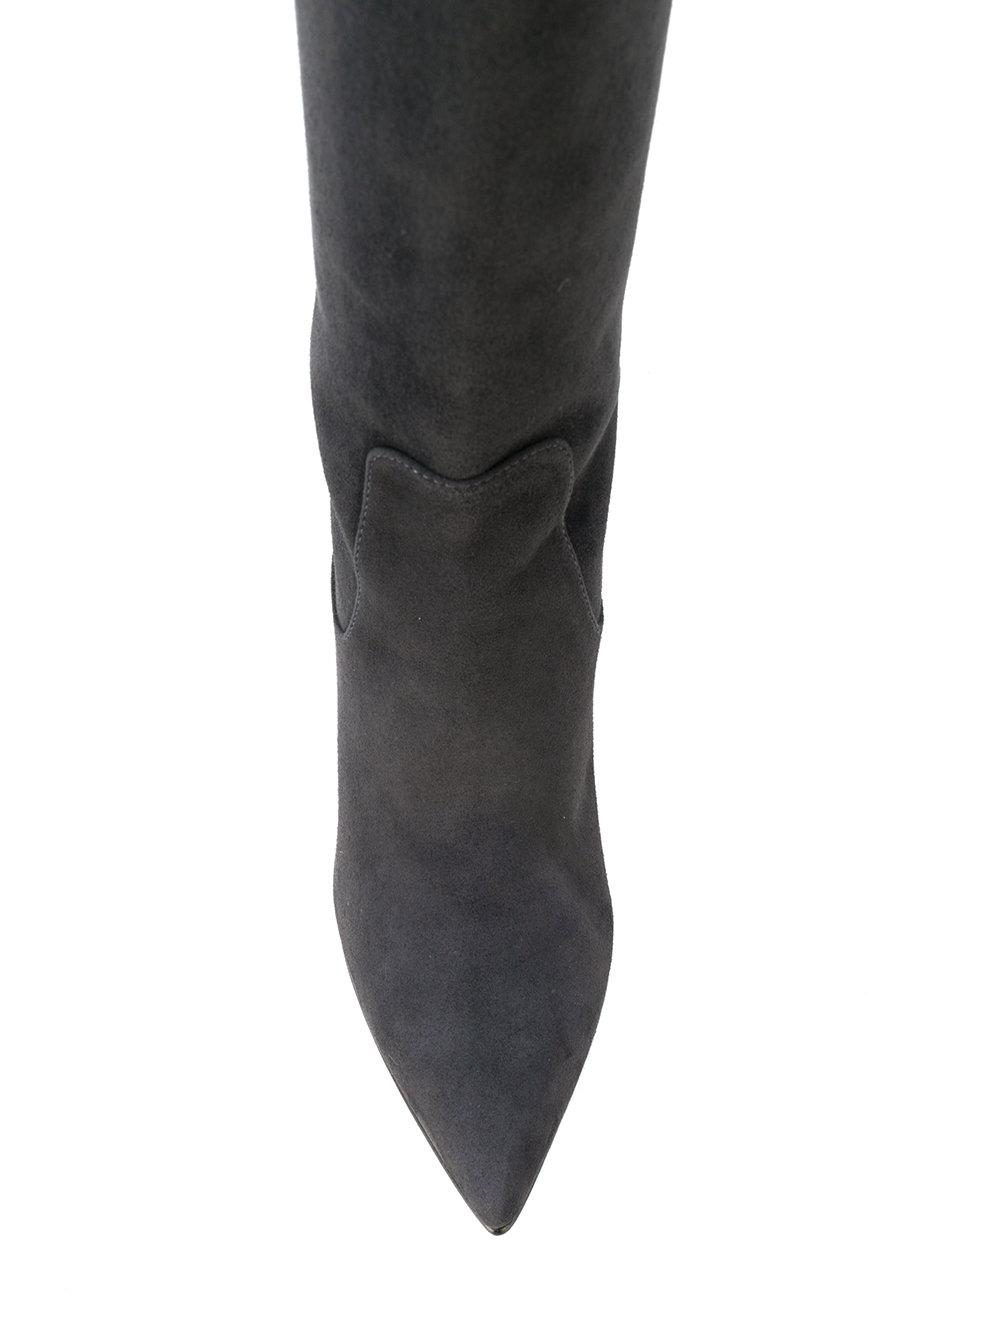 Unützer Suede Knee Boots in Grey (Grey)